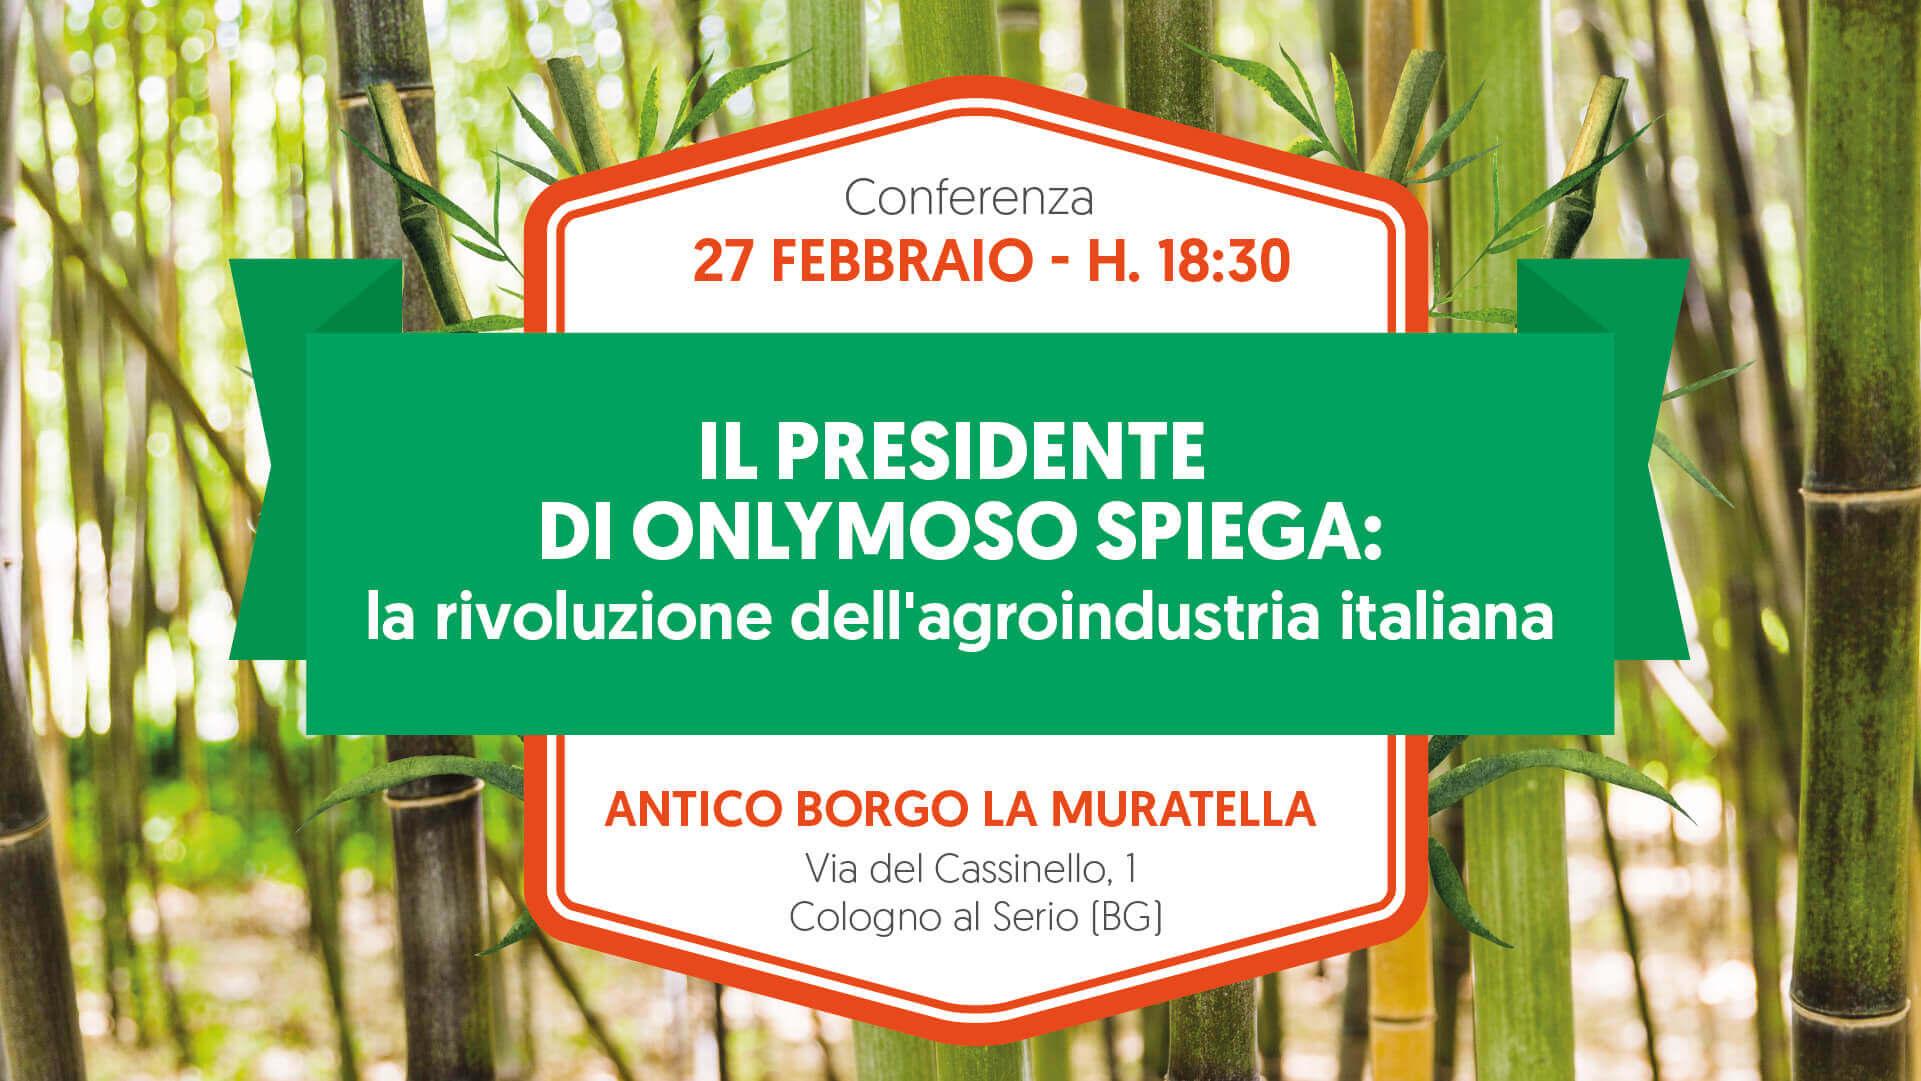 Conferenza Onlymoso Agroindustria Italiana 2